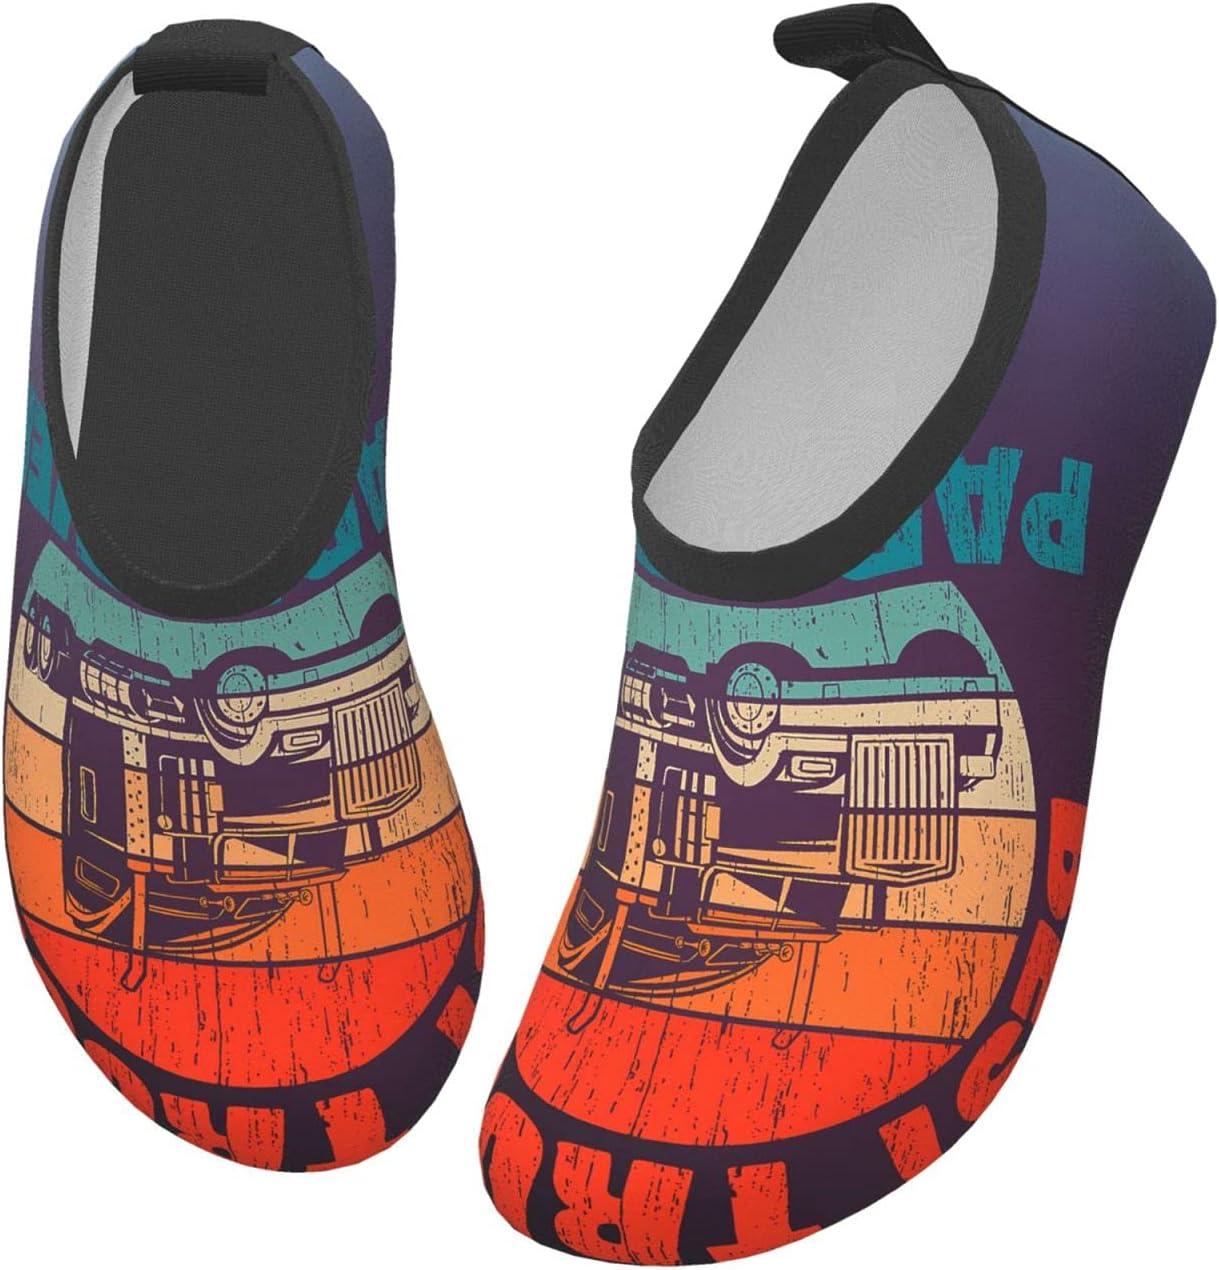 wobzfrok Best Truckin Papa Ever Kids Water Shoes Girls Boys Toddler Non-Slip Quick Dry Aqua Socks for Beach Swim Walking 24/25